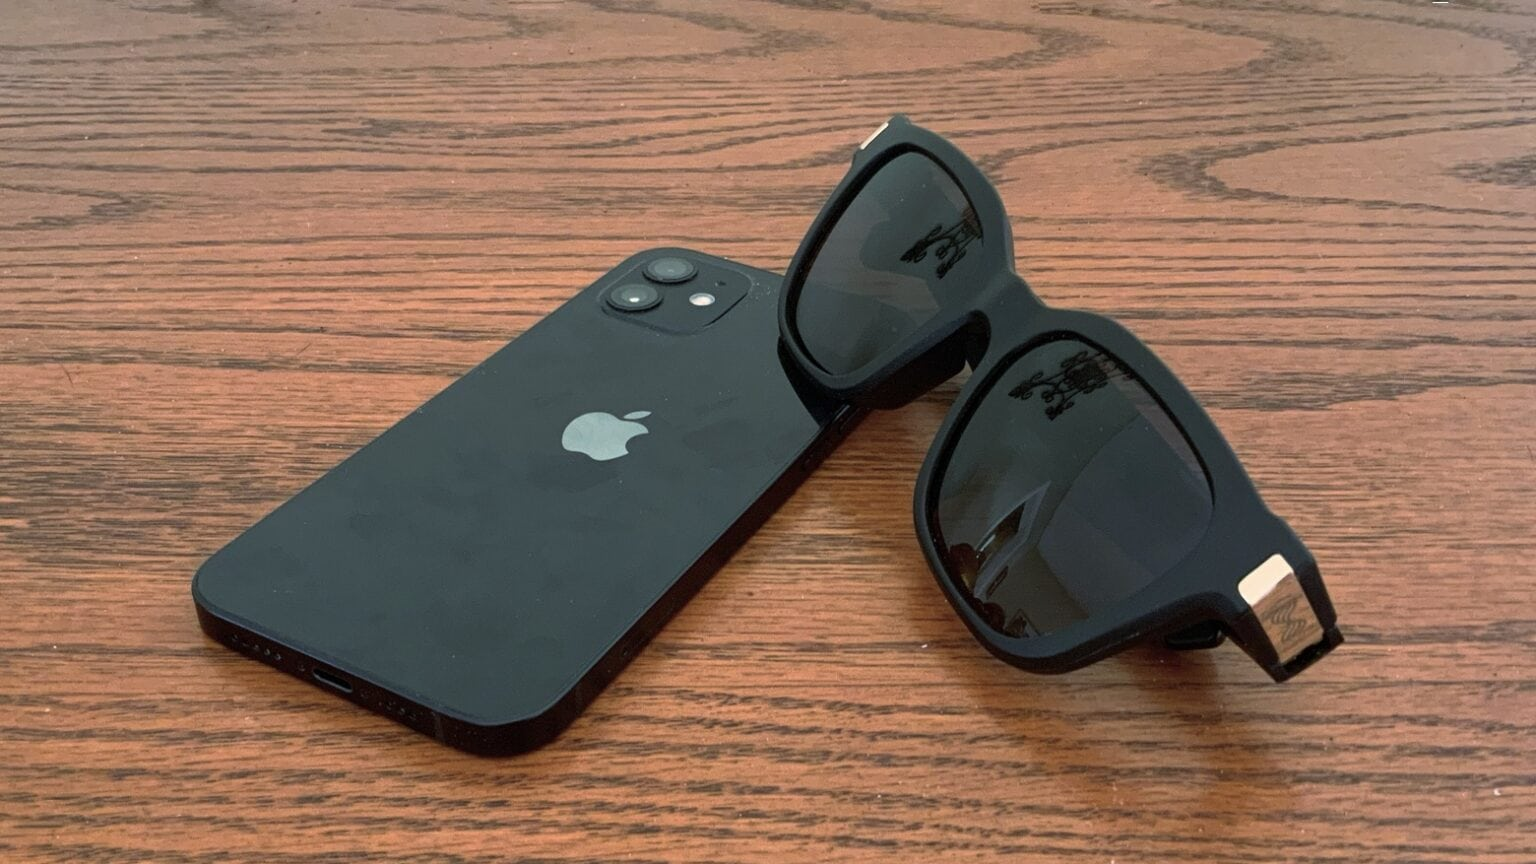 Flows Bandwidth Bluetooth audio sunglasses review